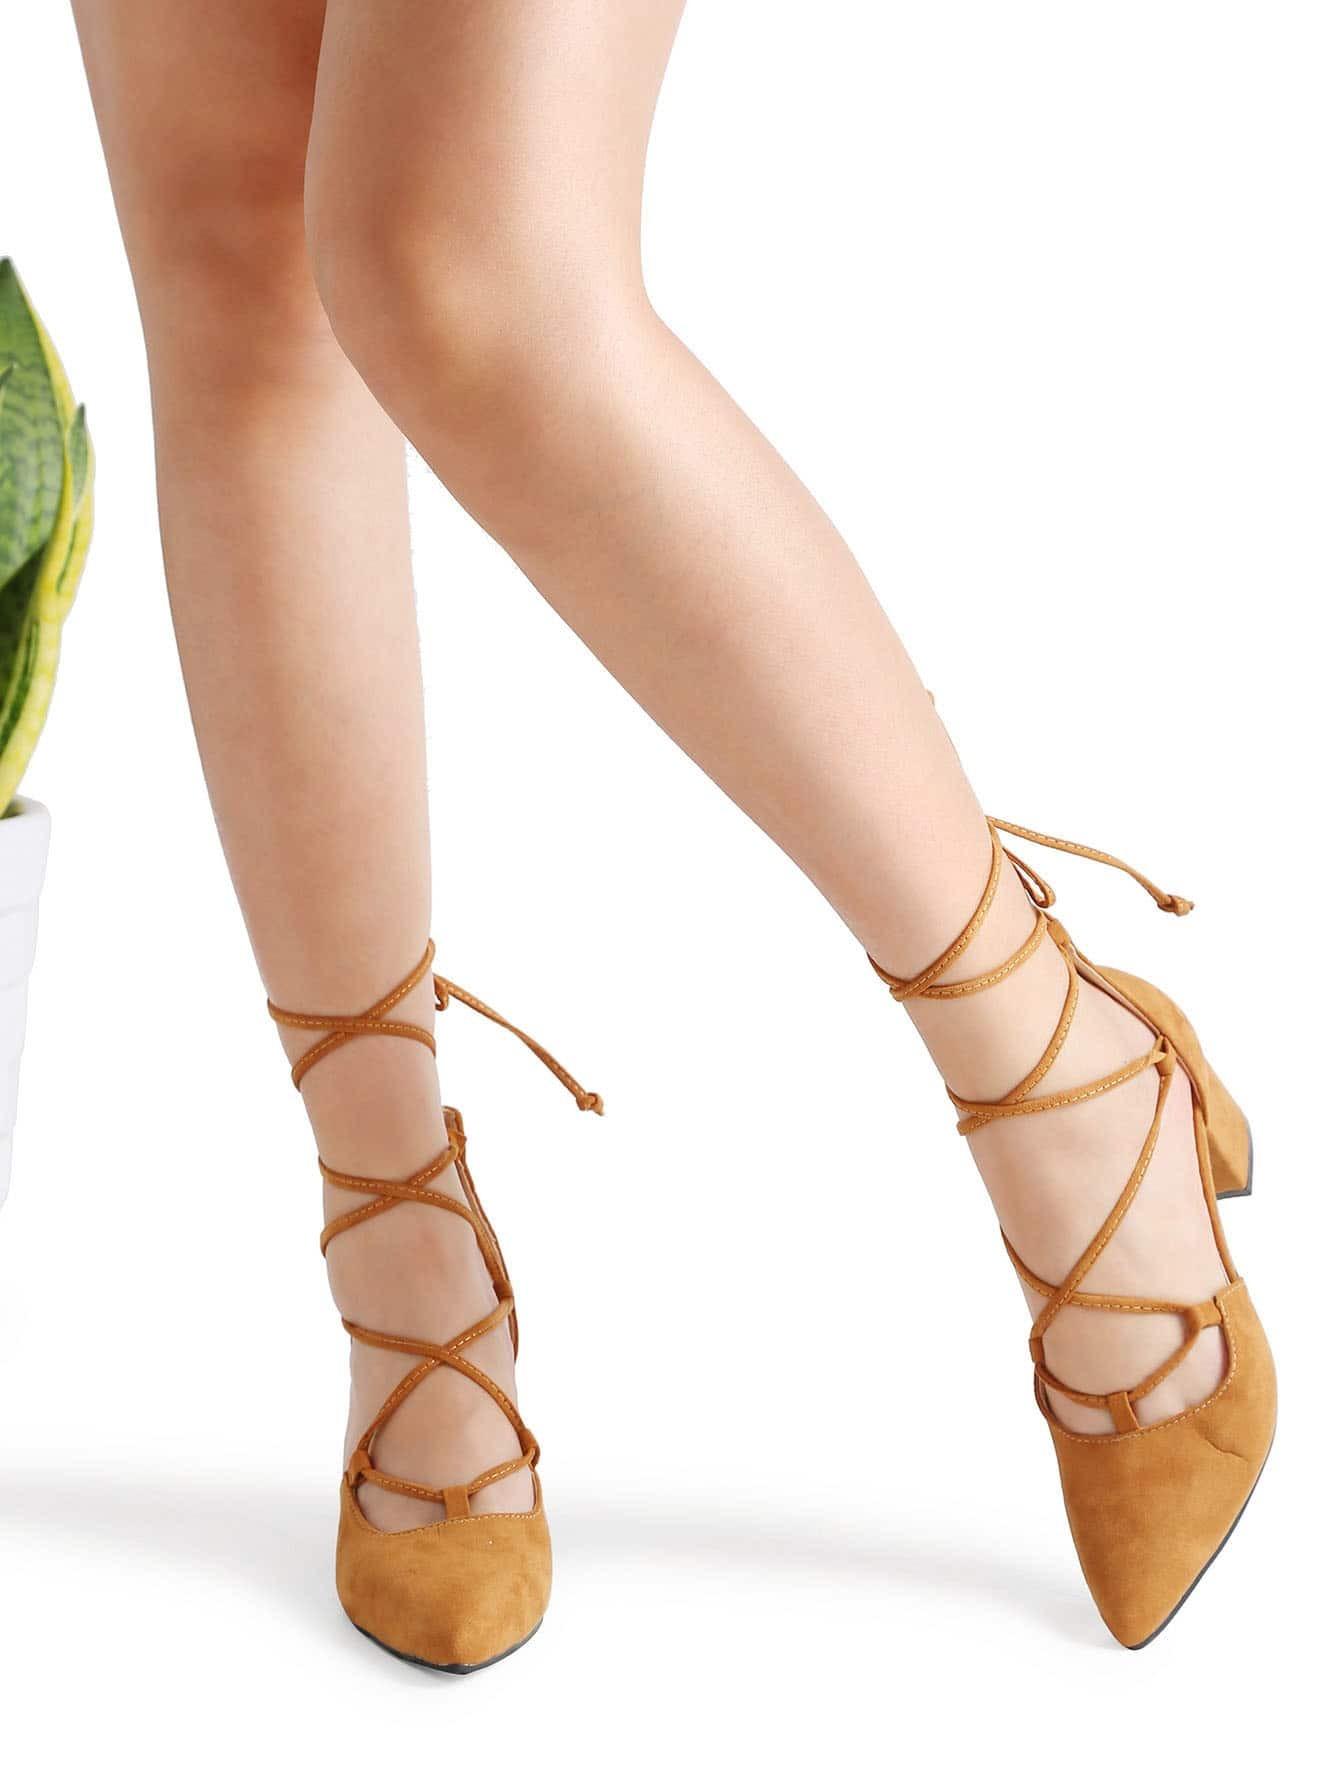 Фото Khaki Point Toe Lace Up Heeled Shoes. Купить с доставкой